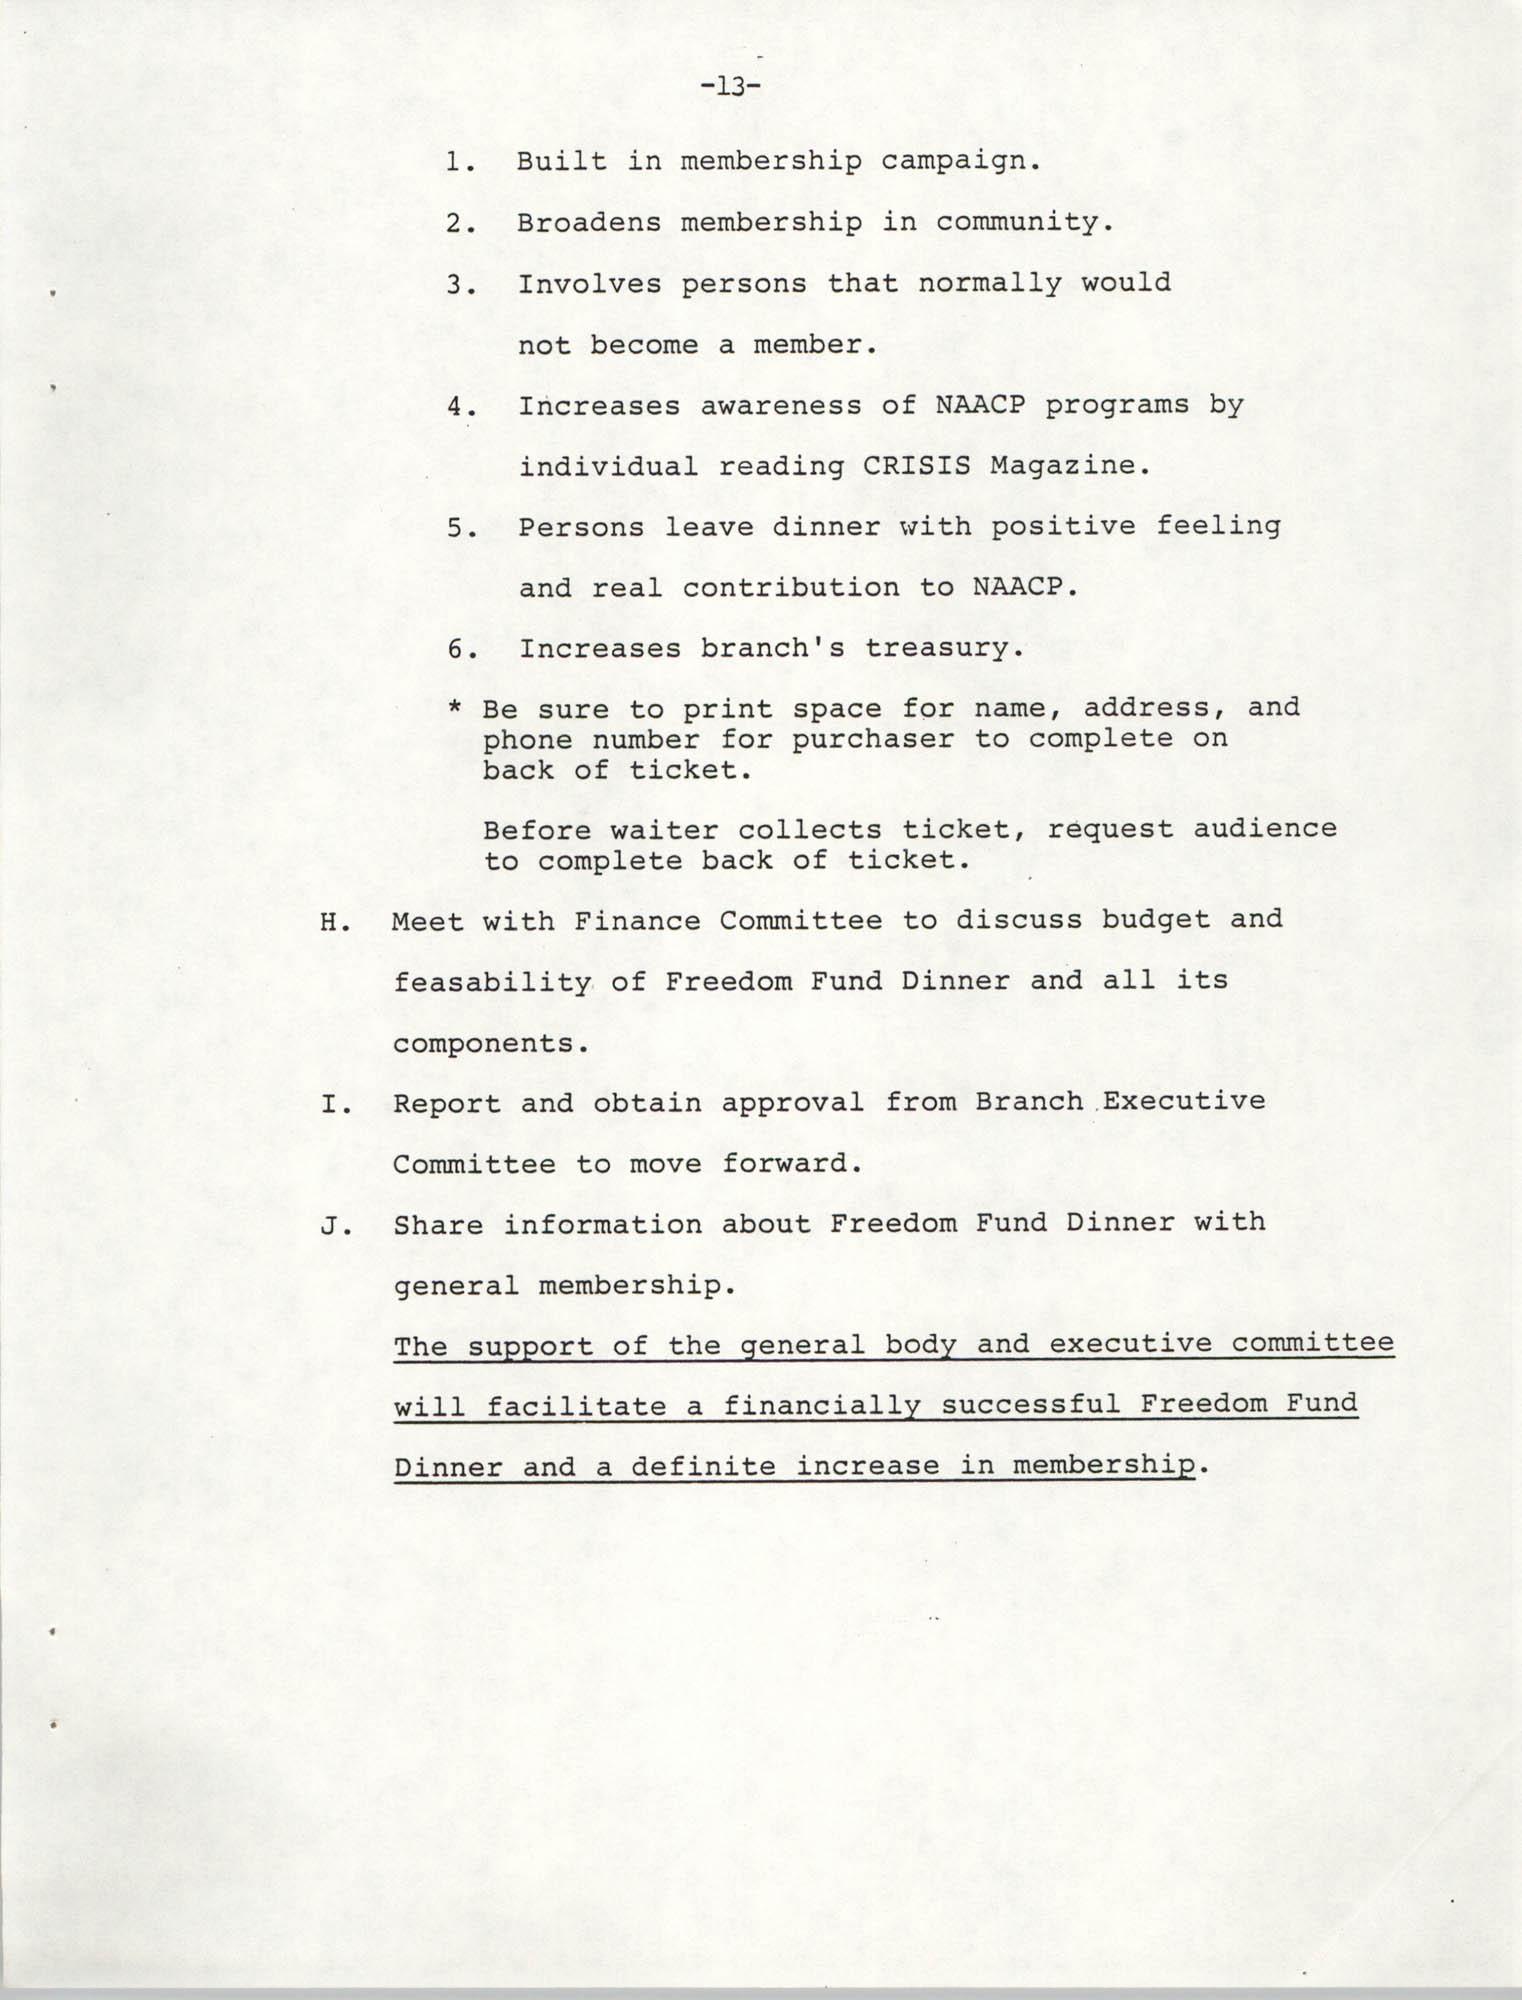 NAACP Mandatory Training Handbook, 1989, Page 13